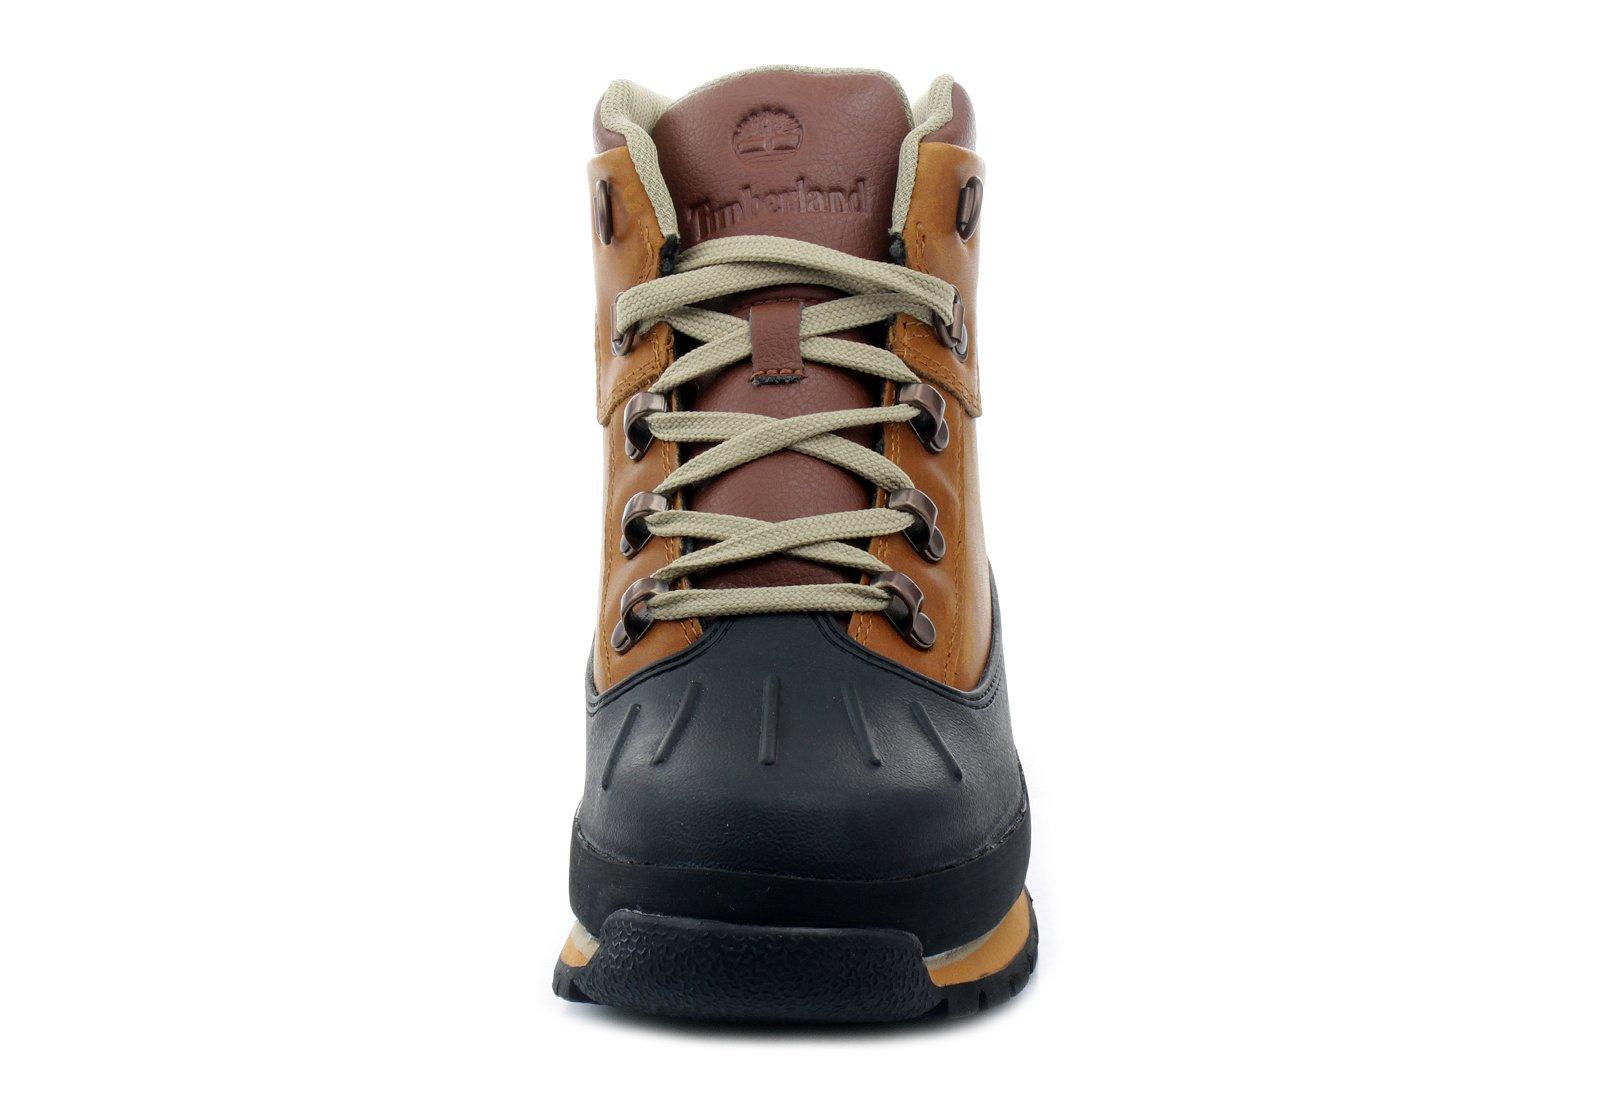 Timberland Junior Euro Shell Toe Hiking Boots Claypot 7 M